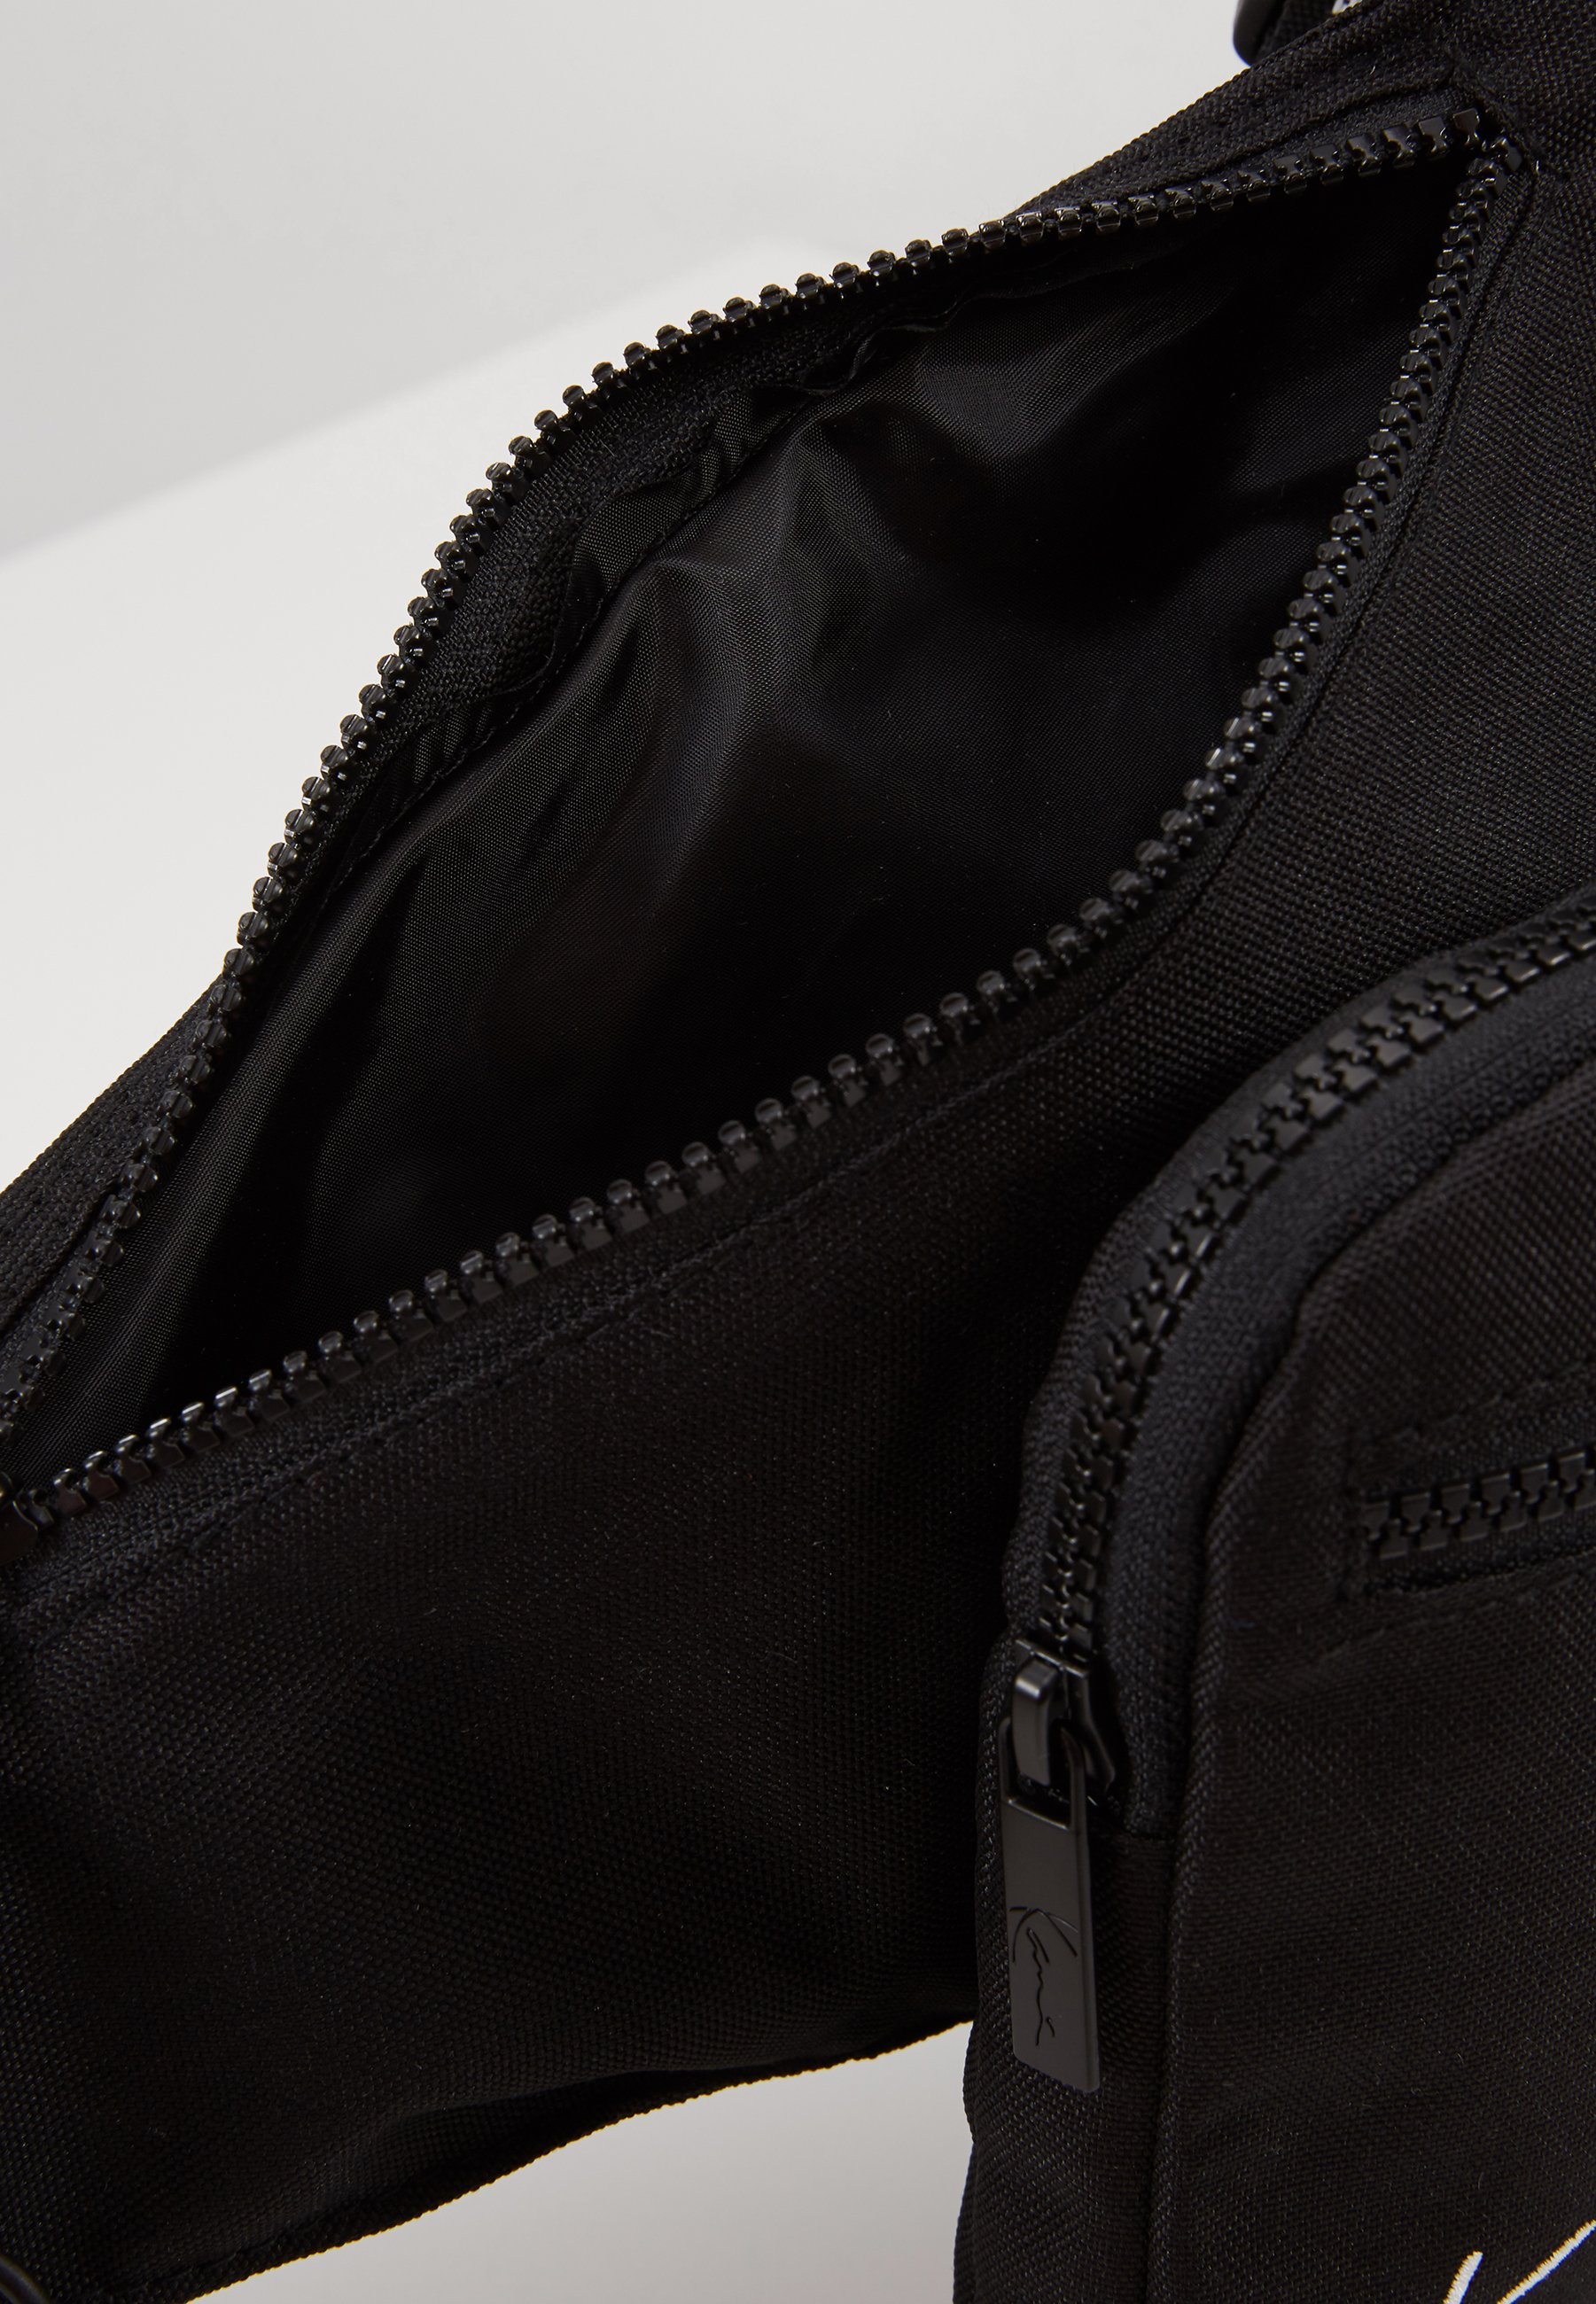 Karl Kani Signature Tape Body Bag - Sac Banane Black/white